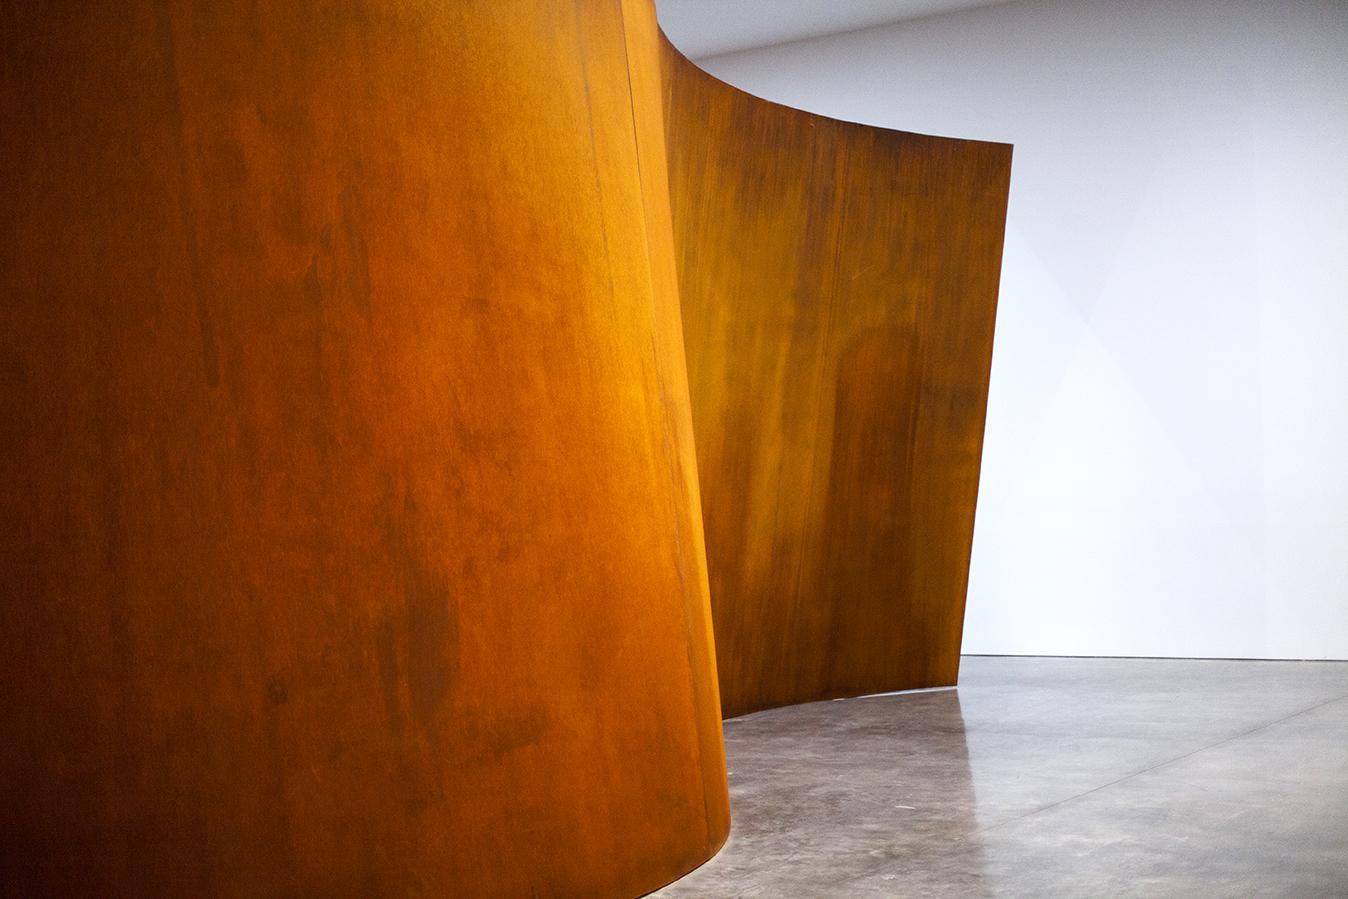 richard serra at gagosian gallery